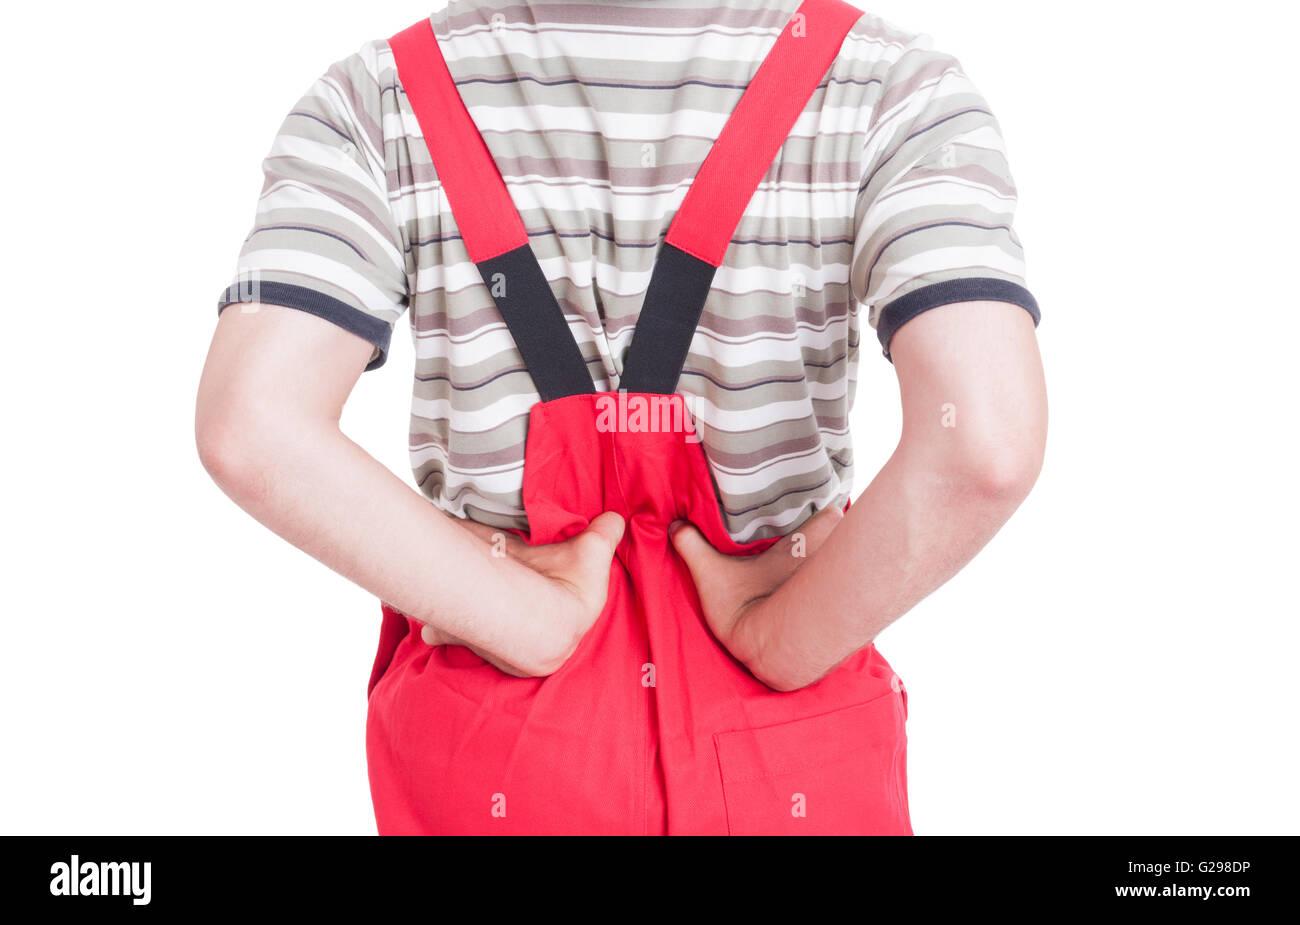 Mechanic or plumber having lumbar area pain or lower back medical problem - Stock Image